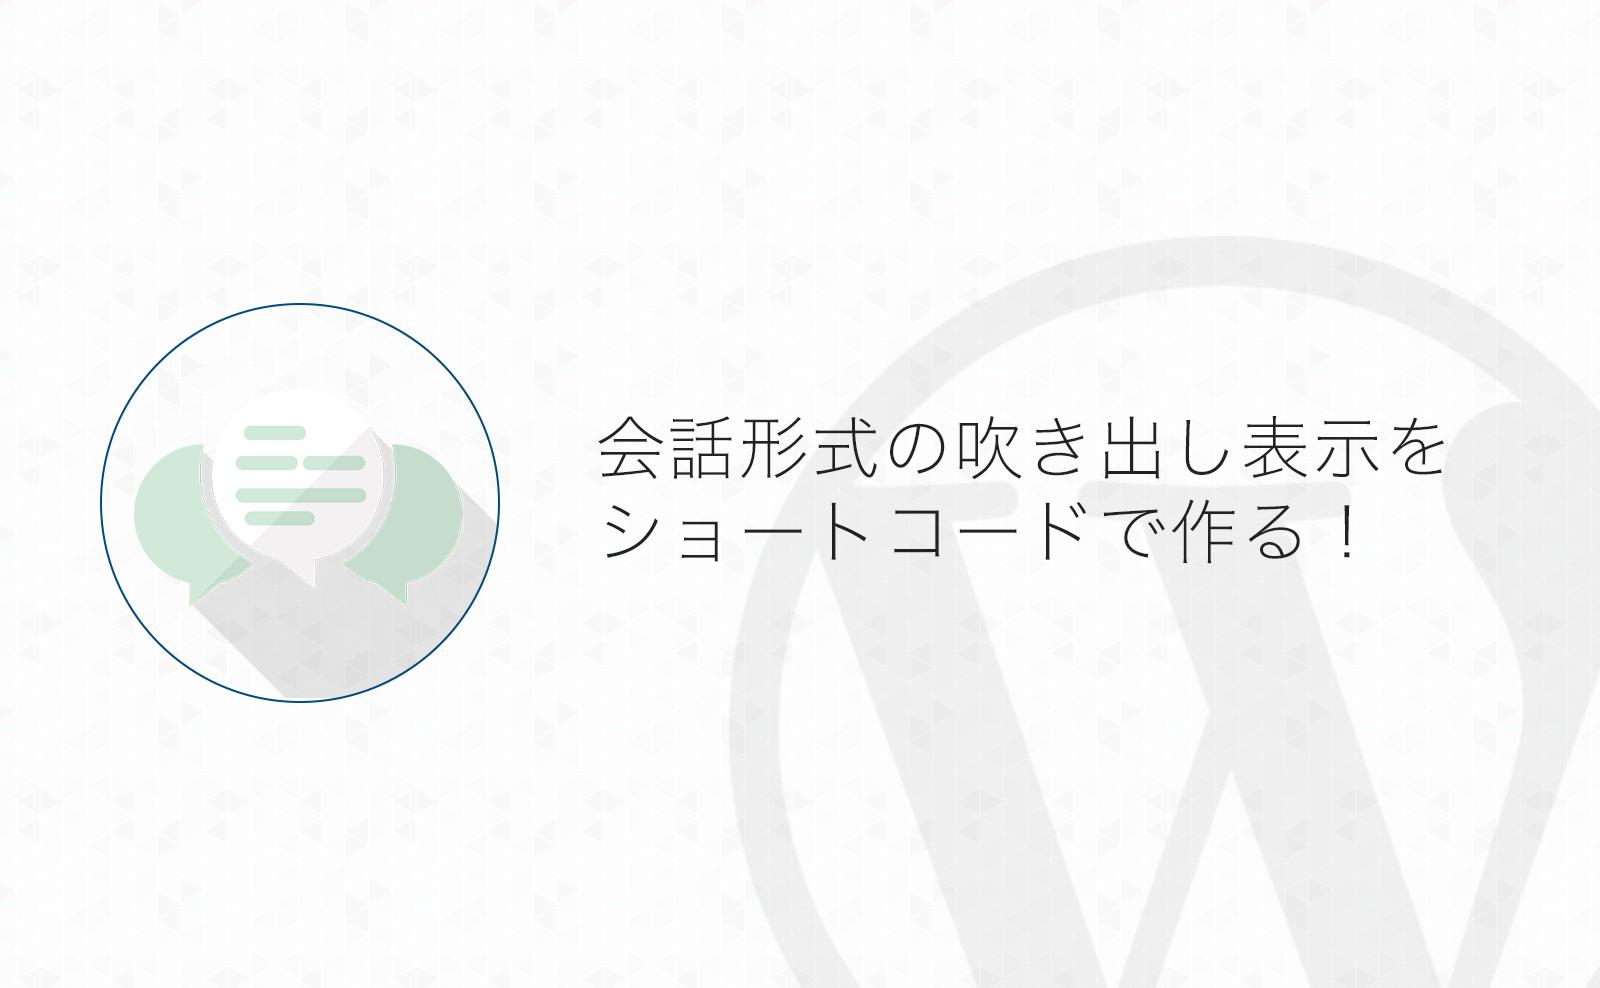 【WordPress】会話表示ができる吹き出しプラグイン的な機能をショートコードで自作する方法